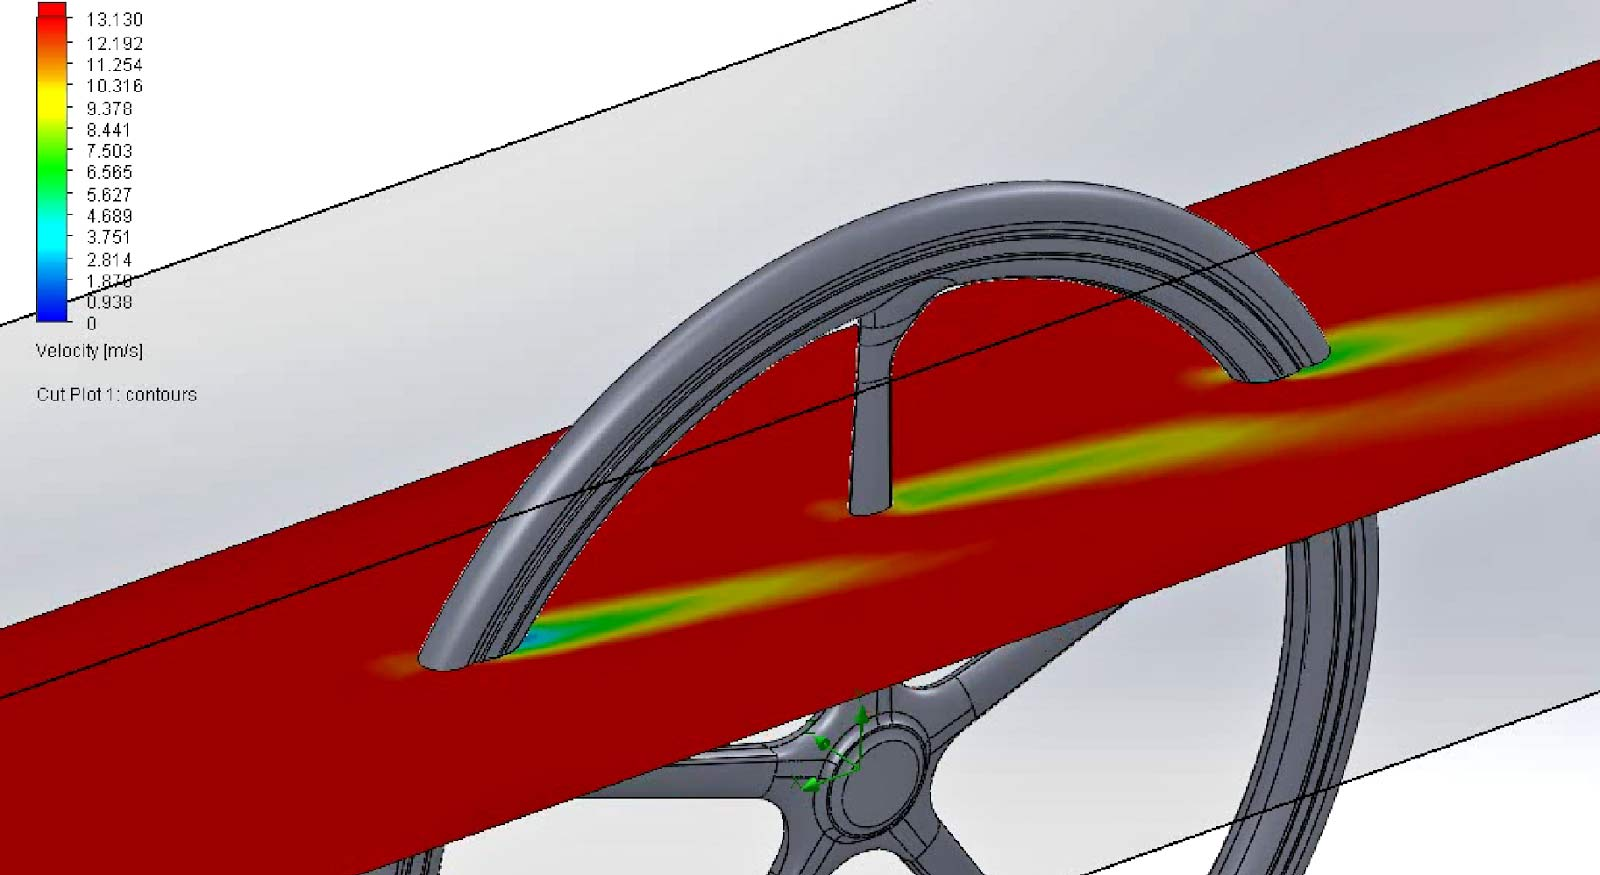 Black Inc FIVE aero carbon 5-spoke tubeless disc brake road bike wheels,CFD aerodynamics